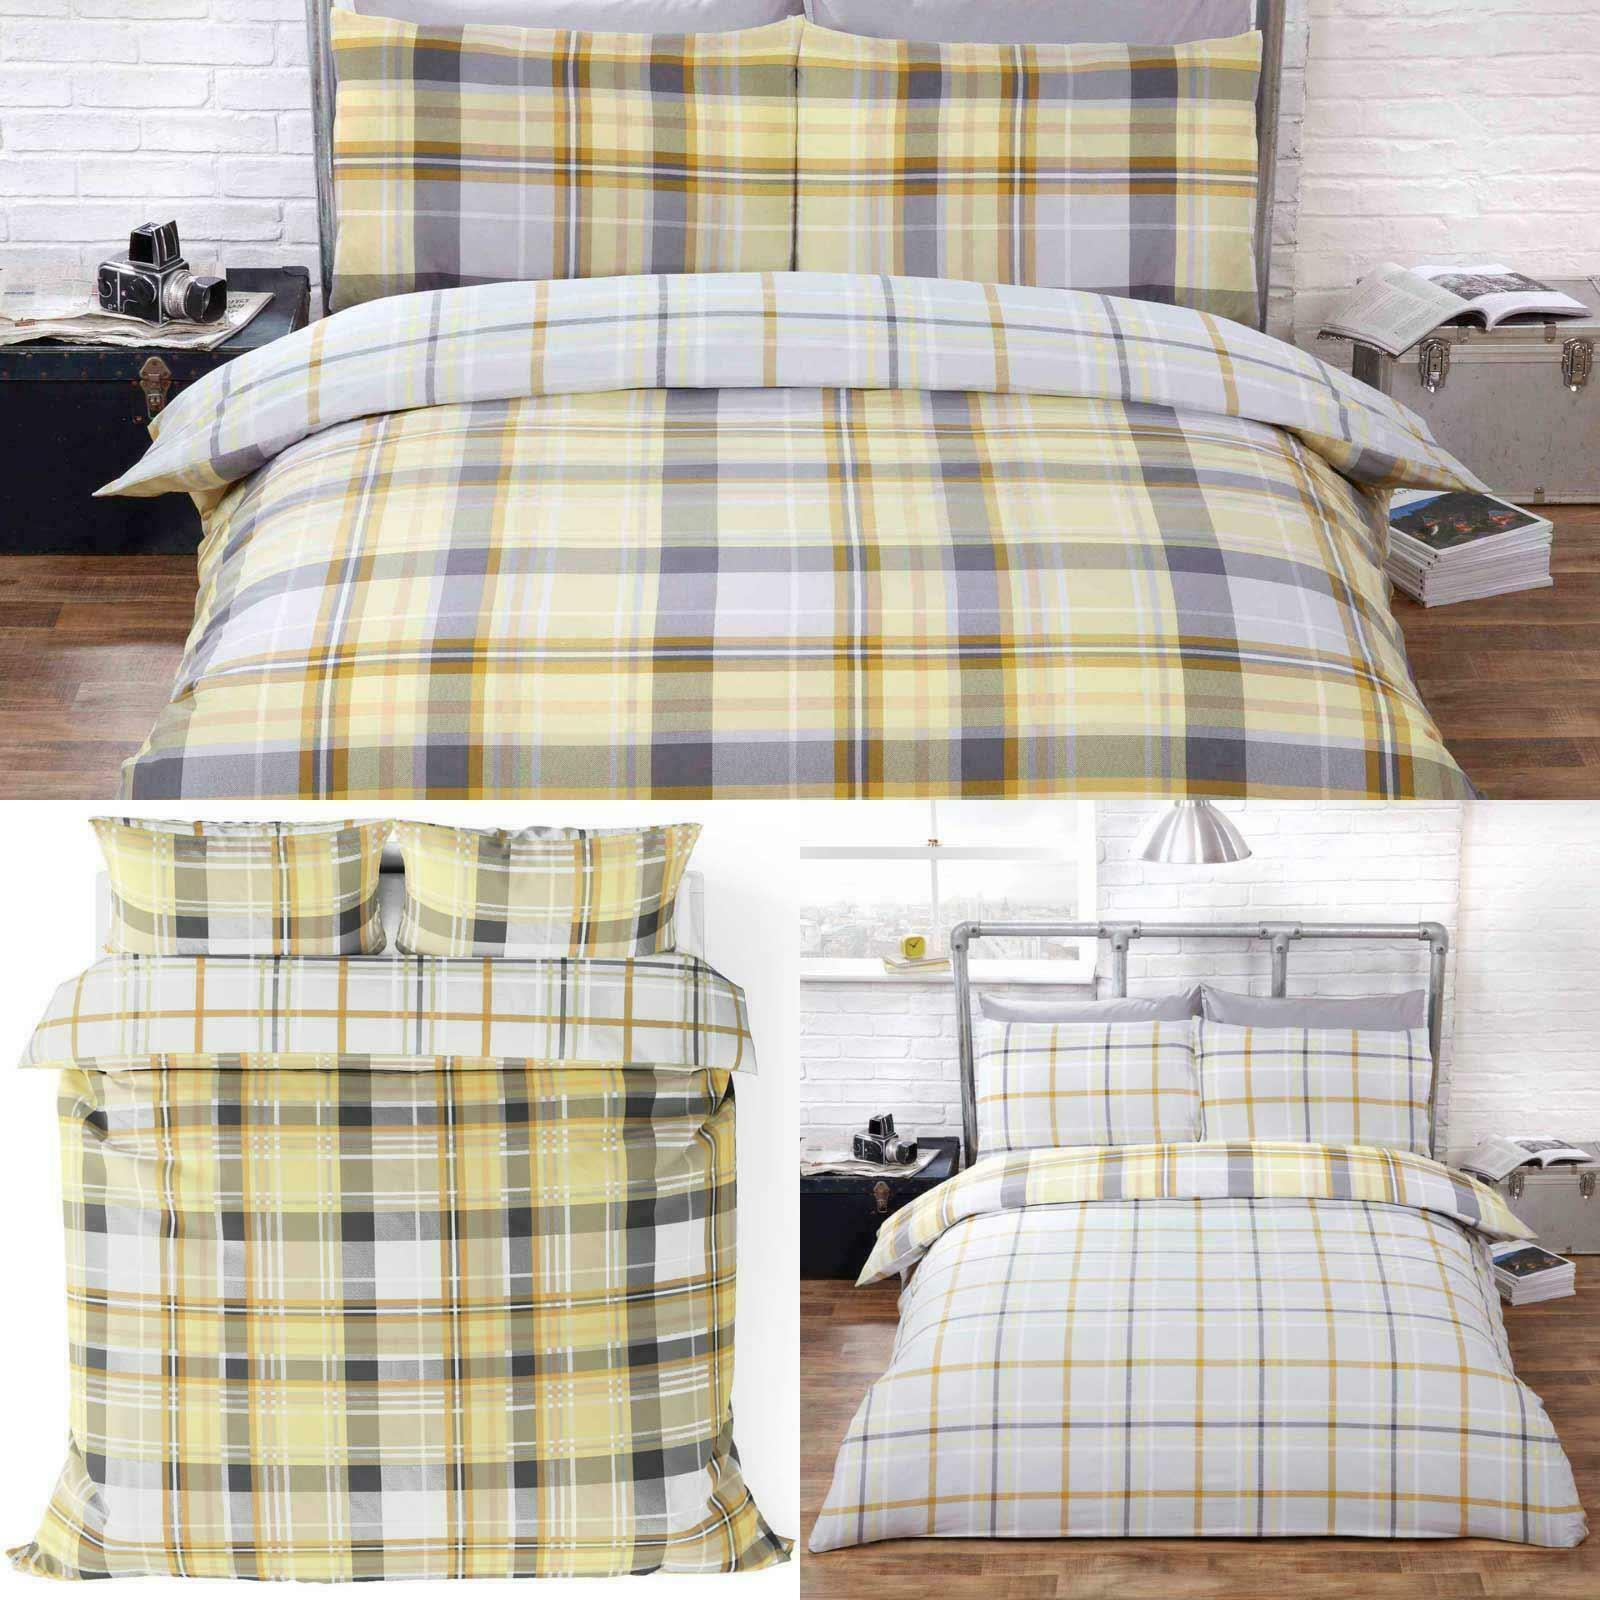 Ochre Duvet Covers Yellow Reversible Tartan Check Hamilton Quilts Bedding Sets Ebay